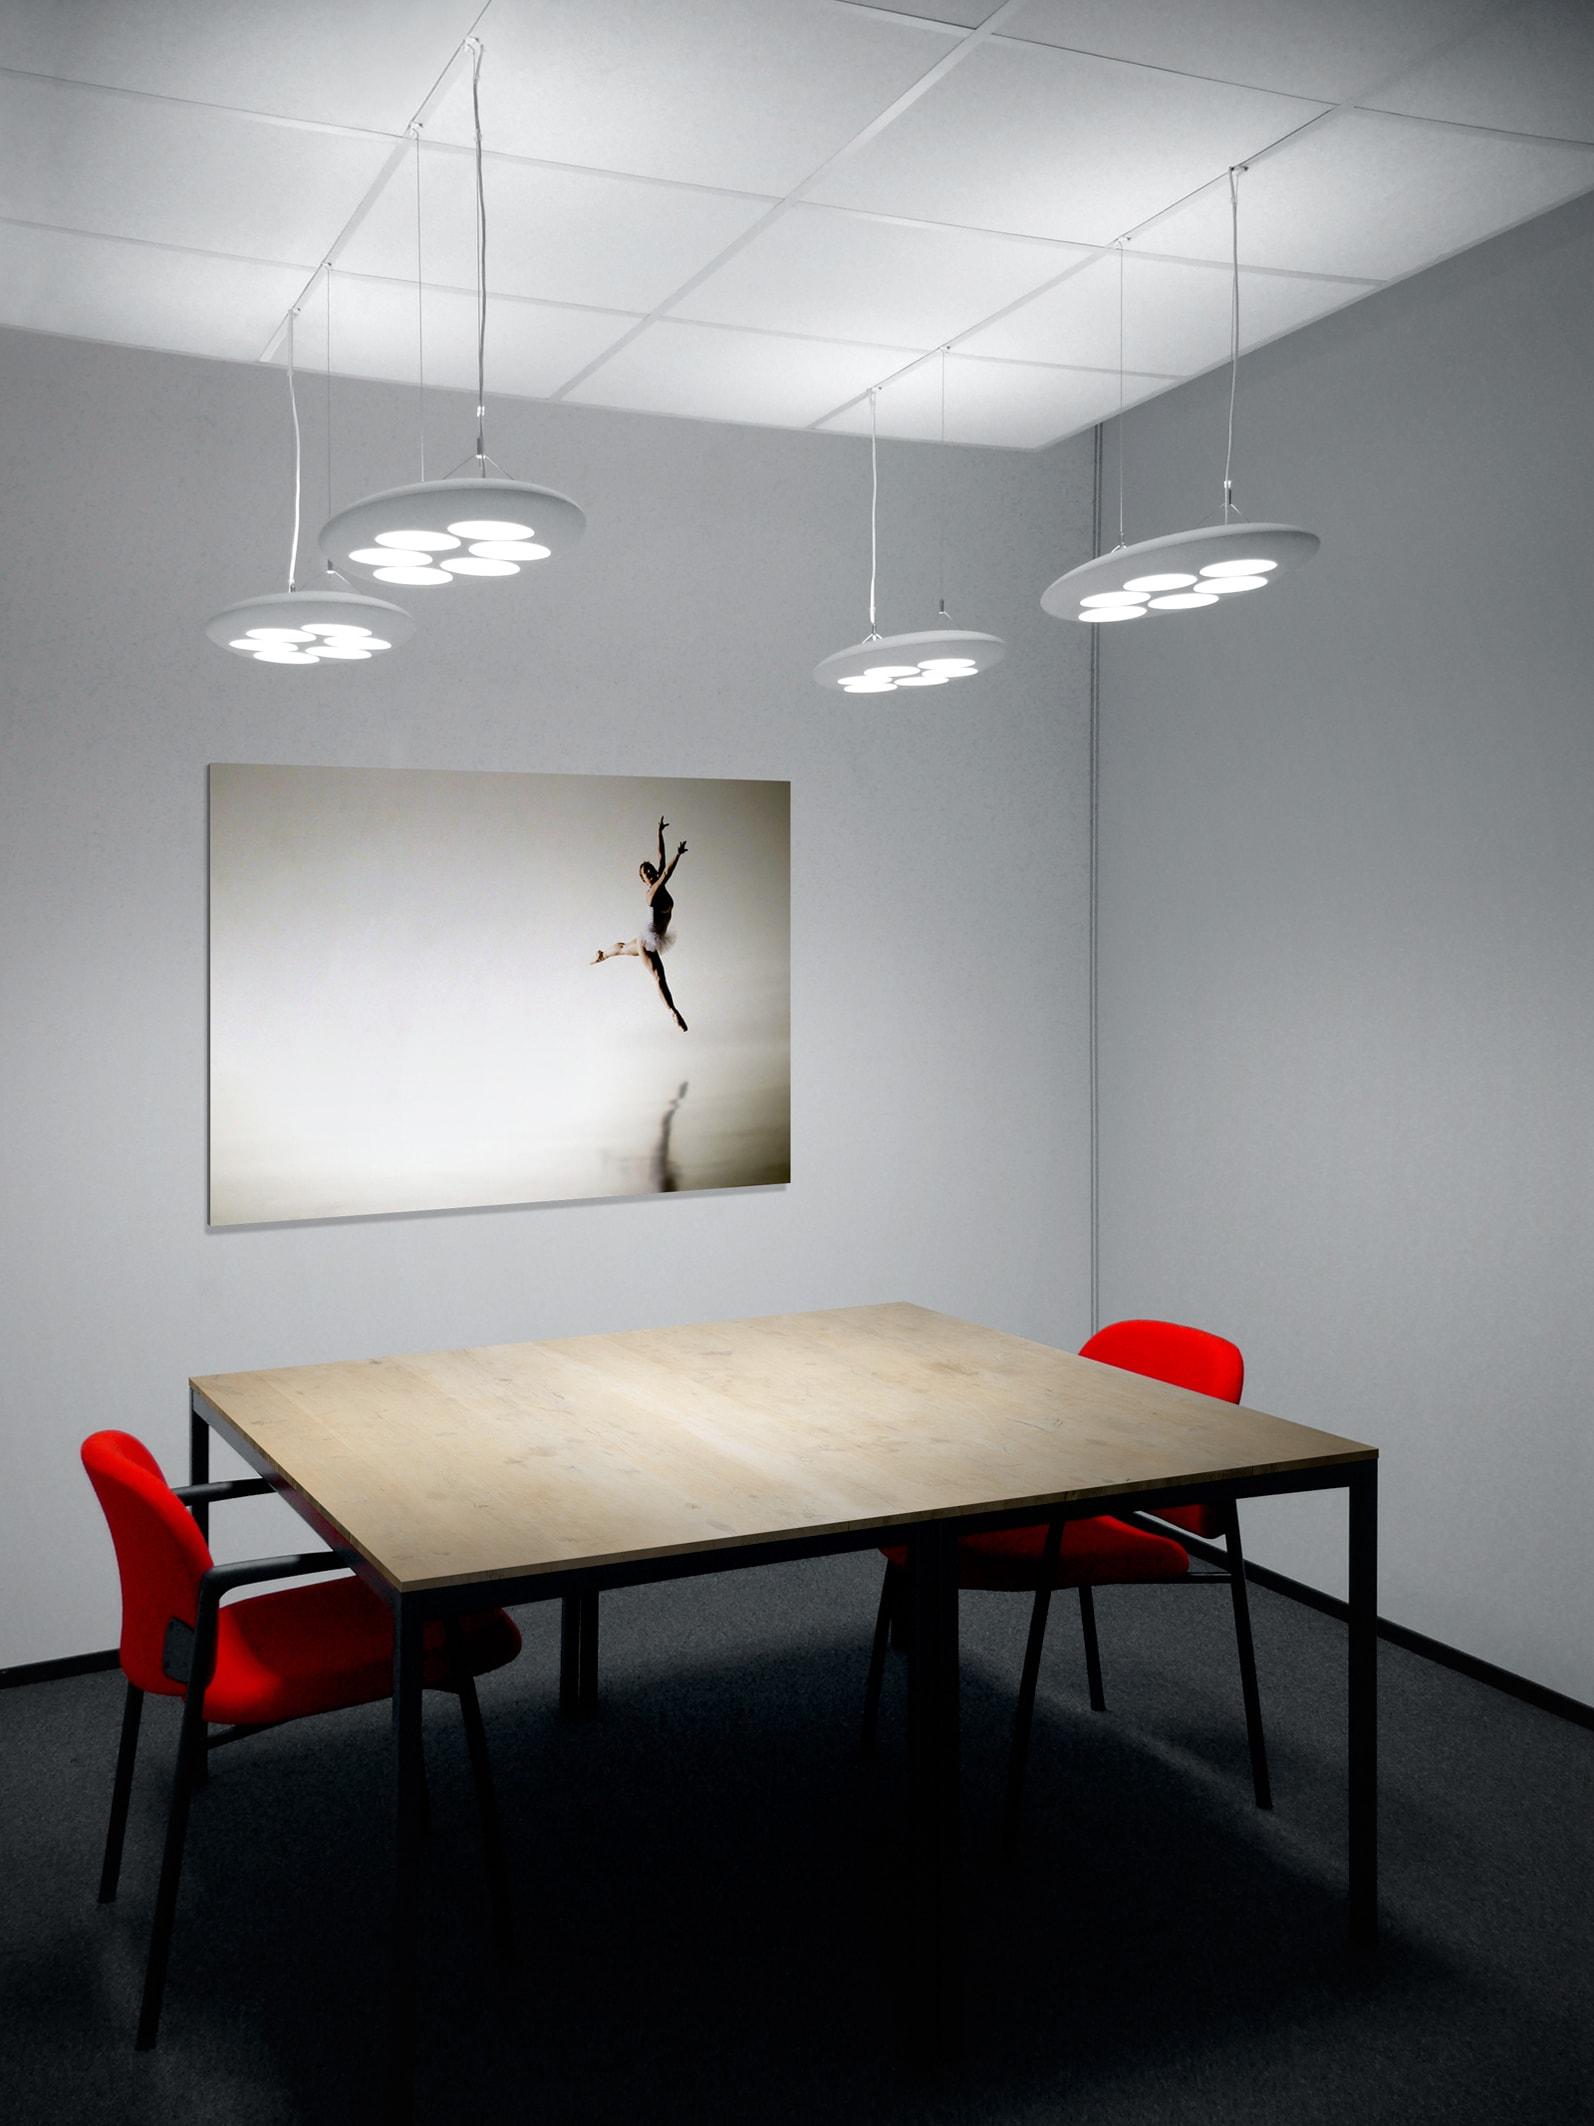 Philips lumistone pendelleuchte inspirierendes licht f r b roarbeitspl tze - Gloeilamp tizio lamp ...